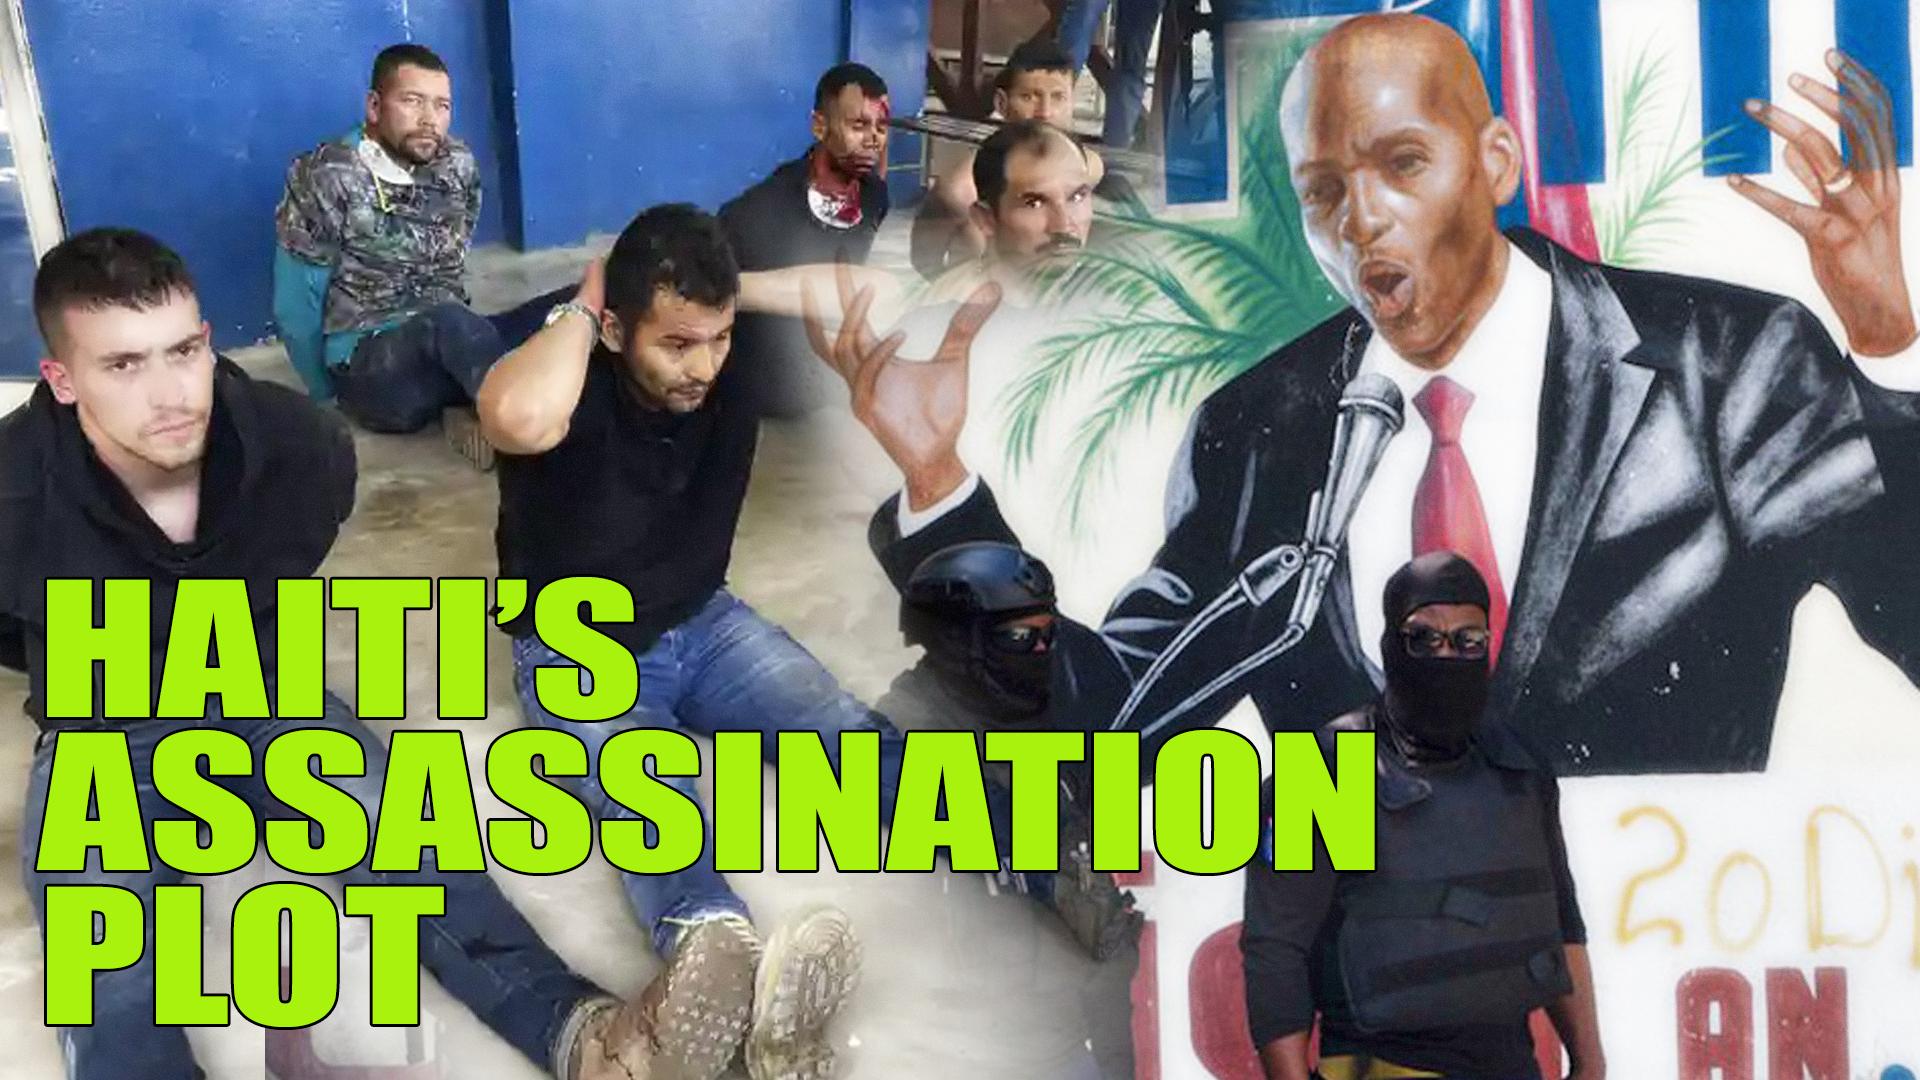 Haiti assassination plot and US connection